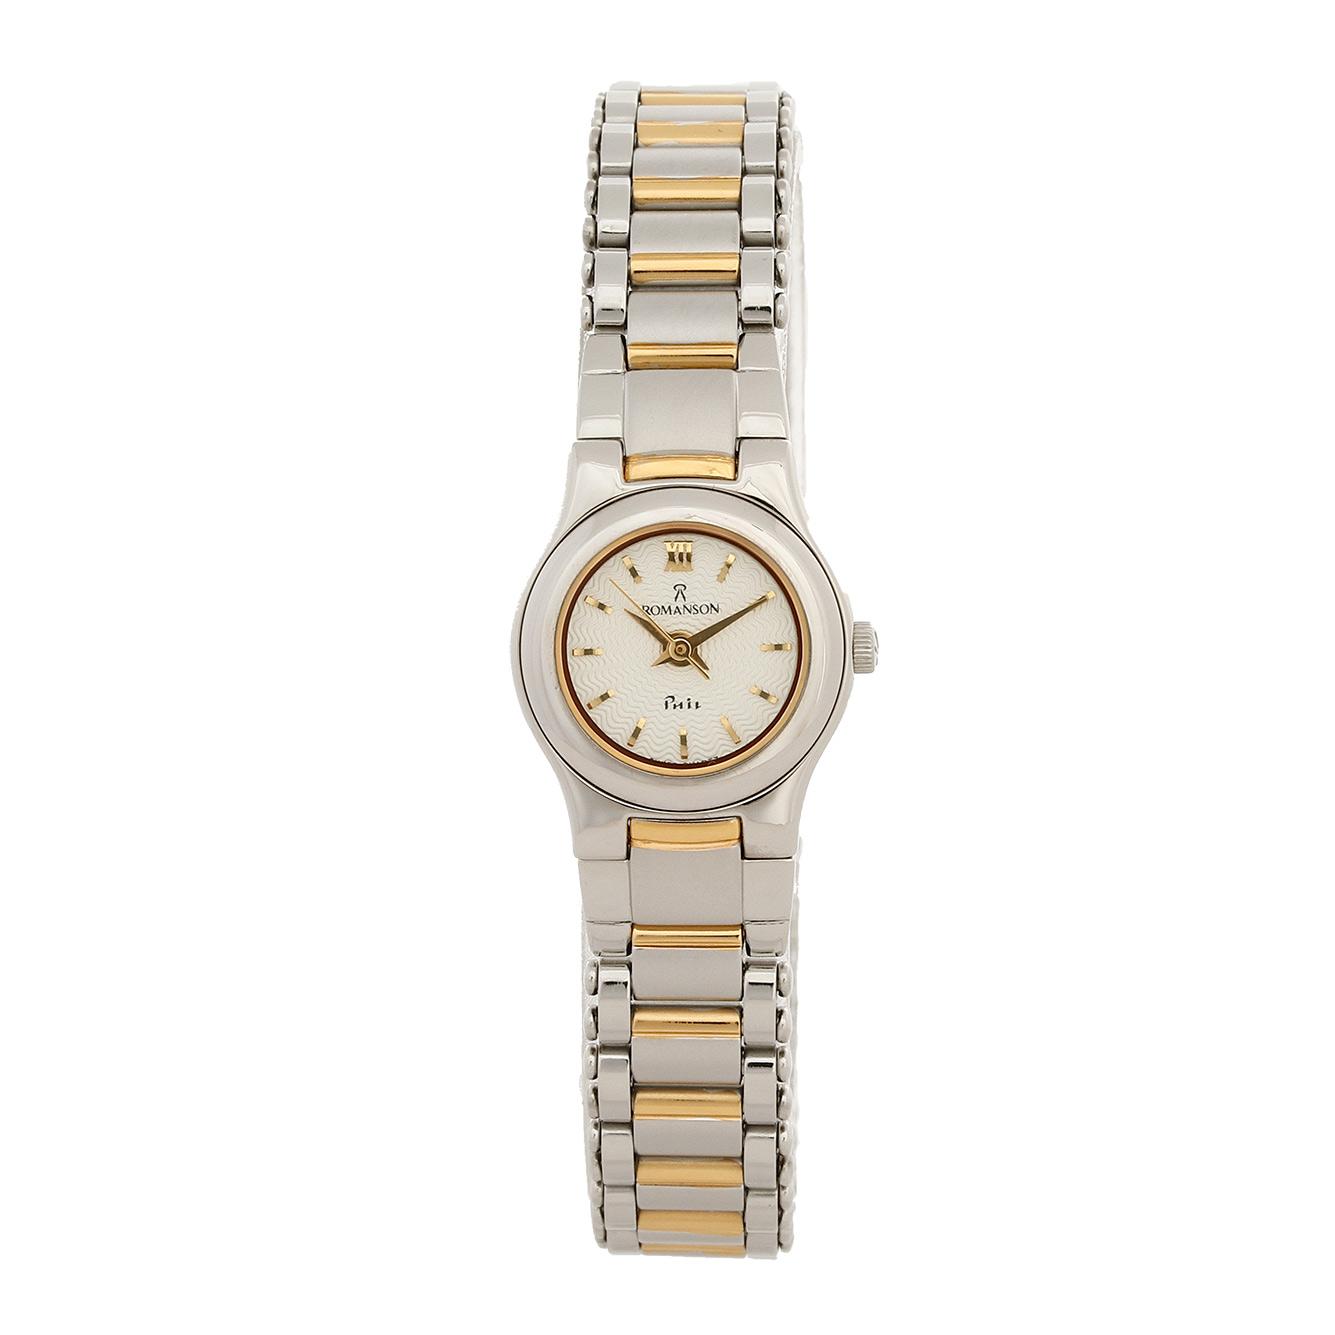 ساعت مچی عقربه ای زنانه رومانسون مدل NM4510LL1CAS1G 35